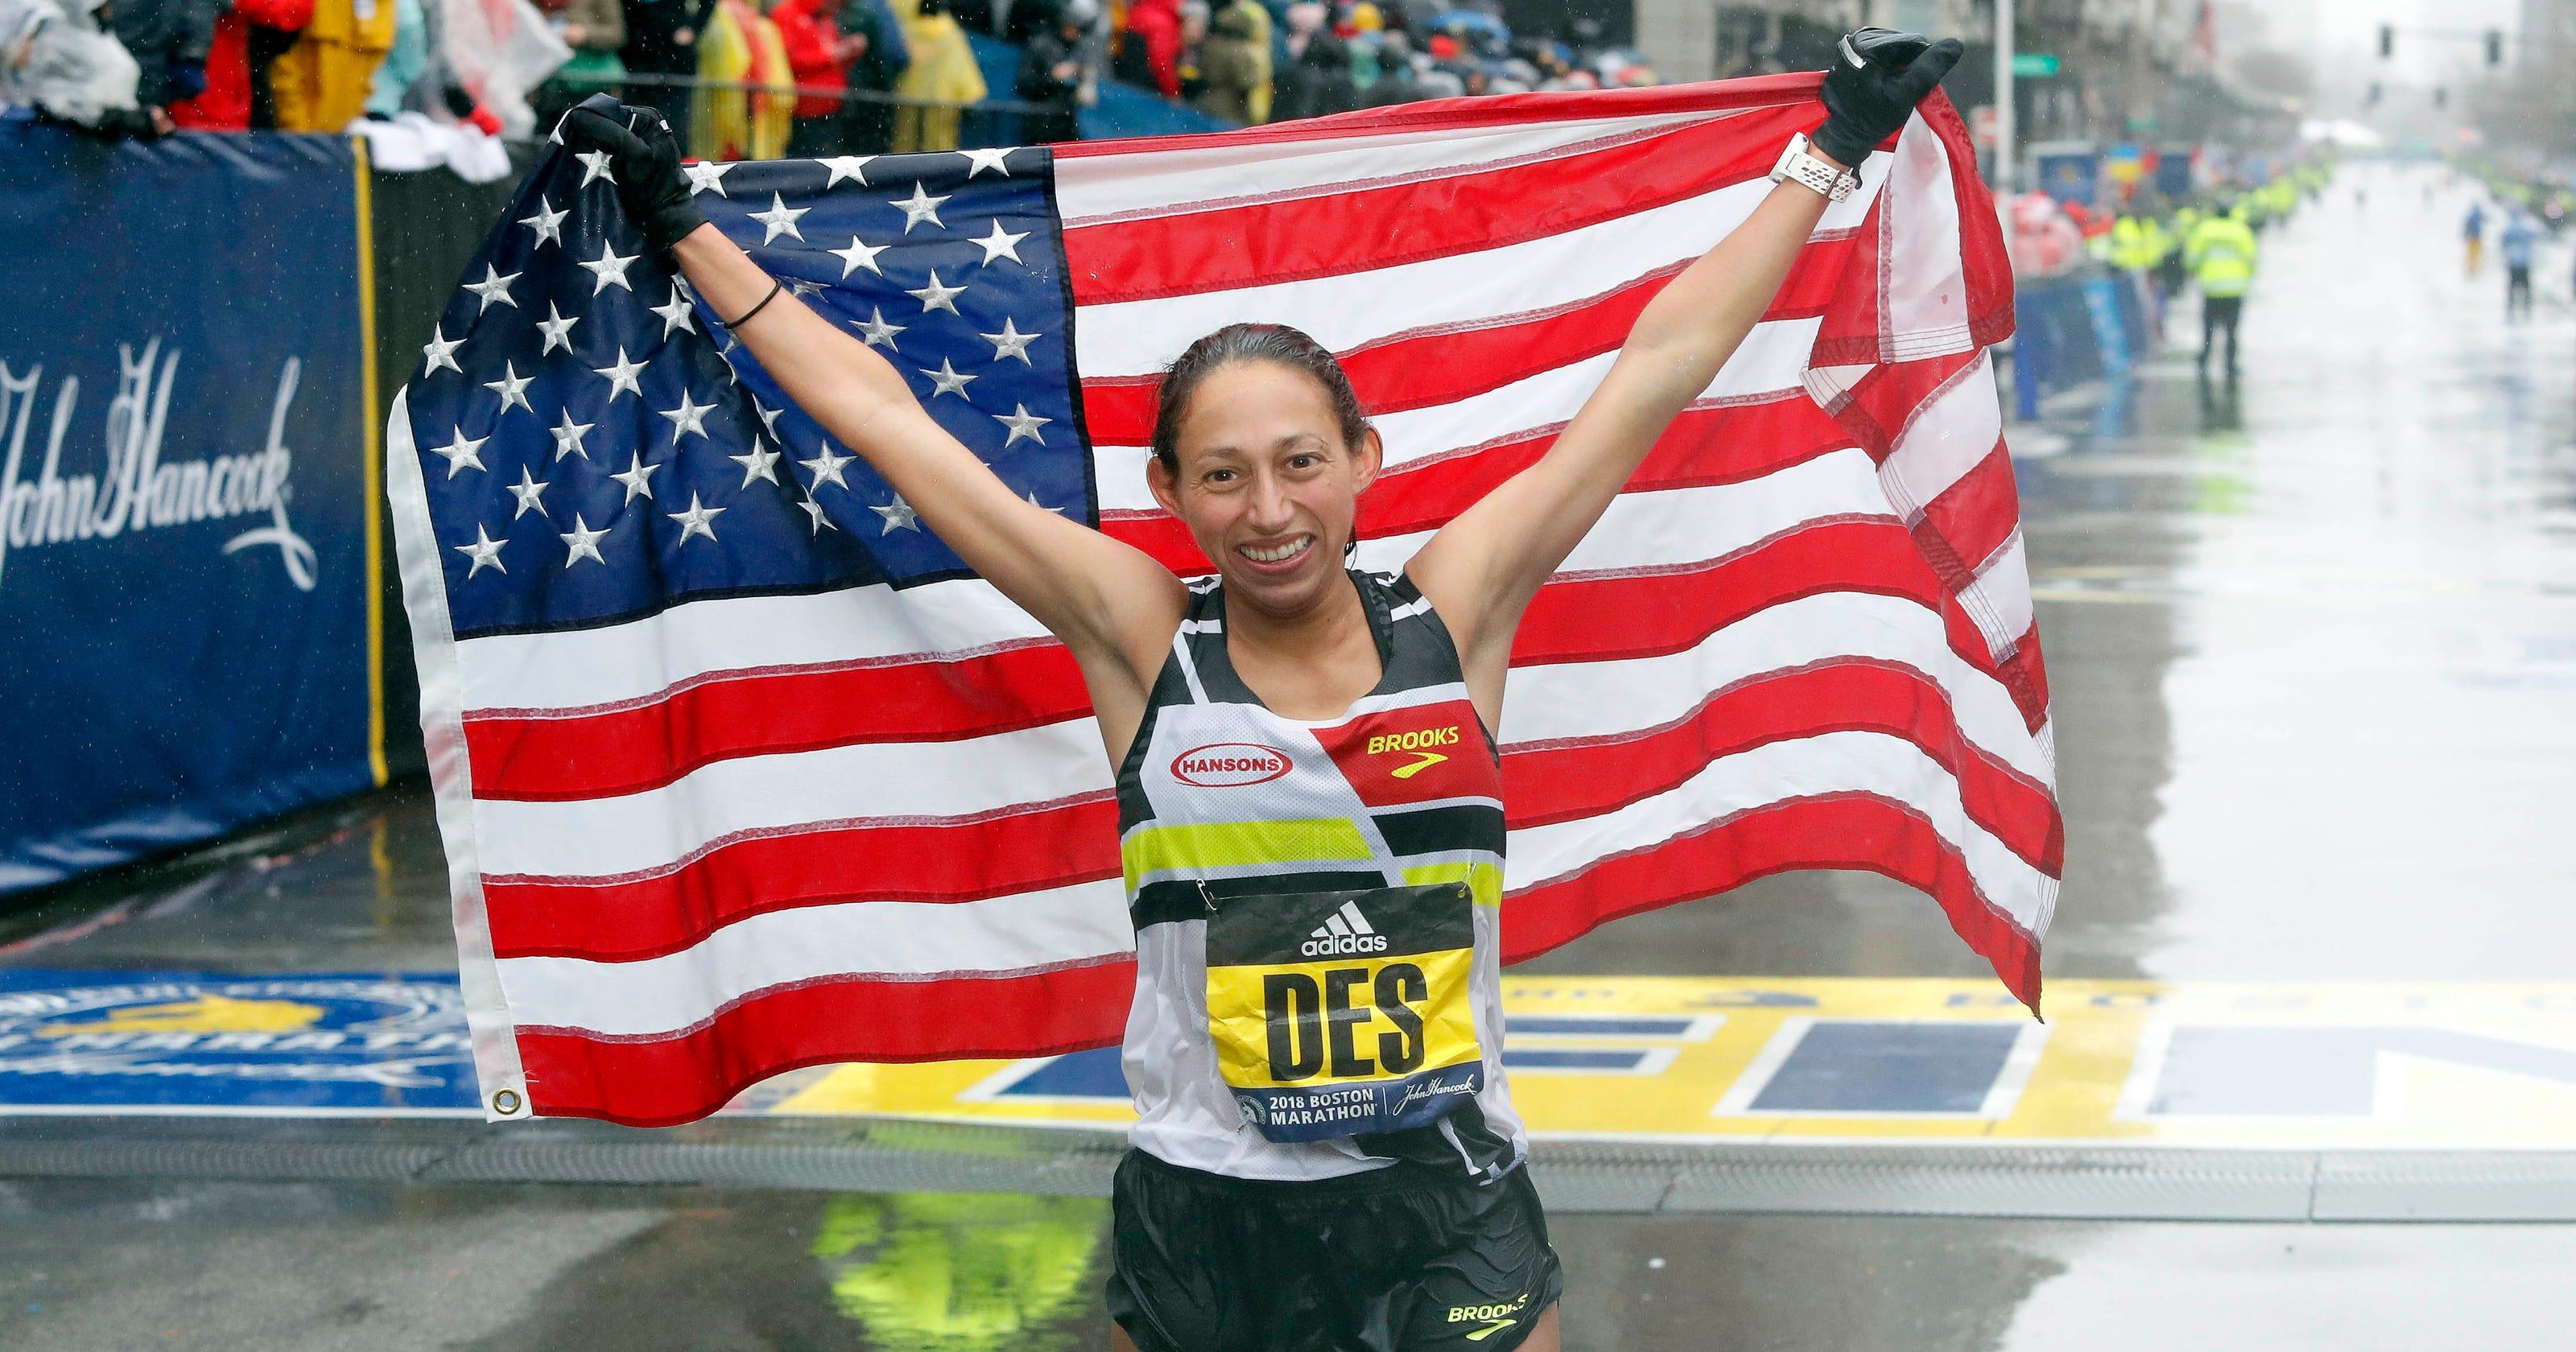 7d326cf5624 Boston Marathon  Desiree Linden first American woman to win since 1985